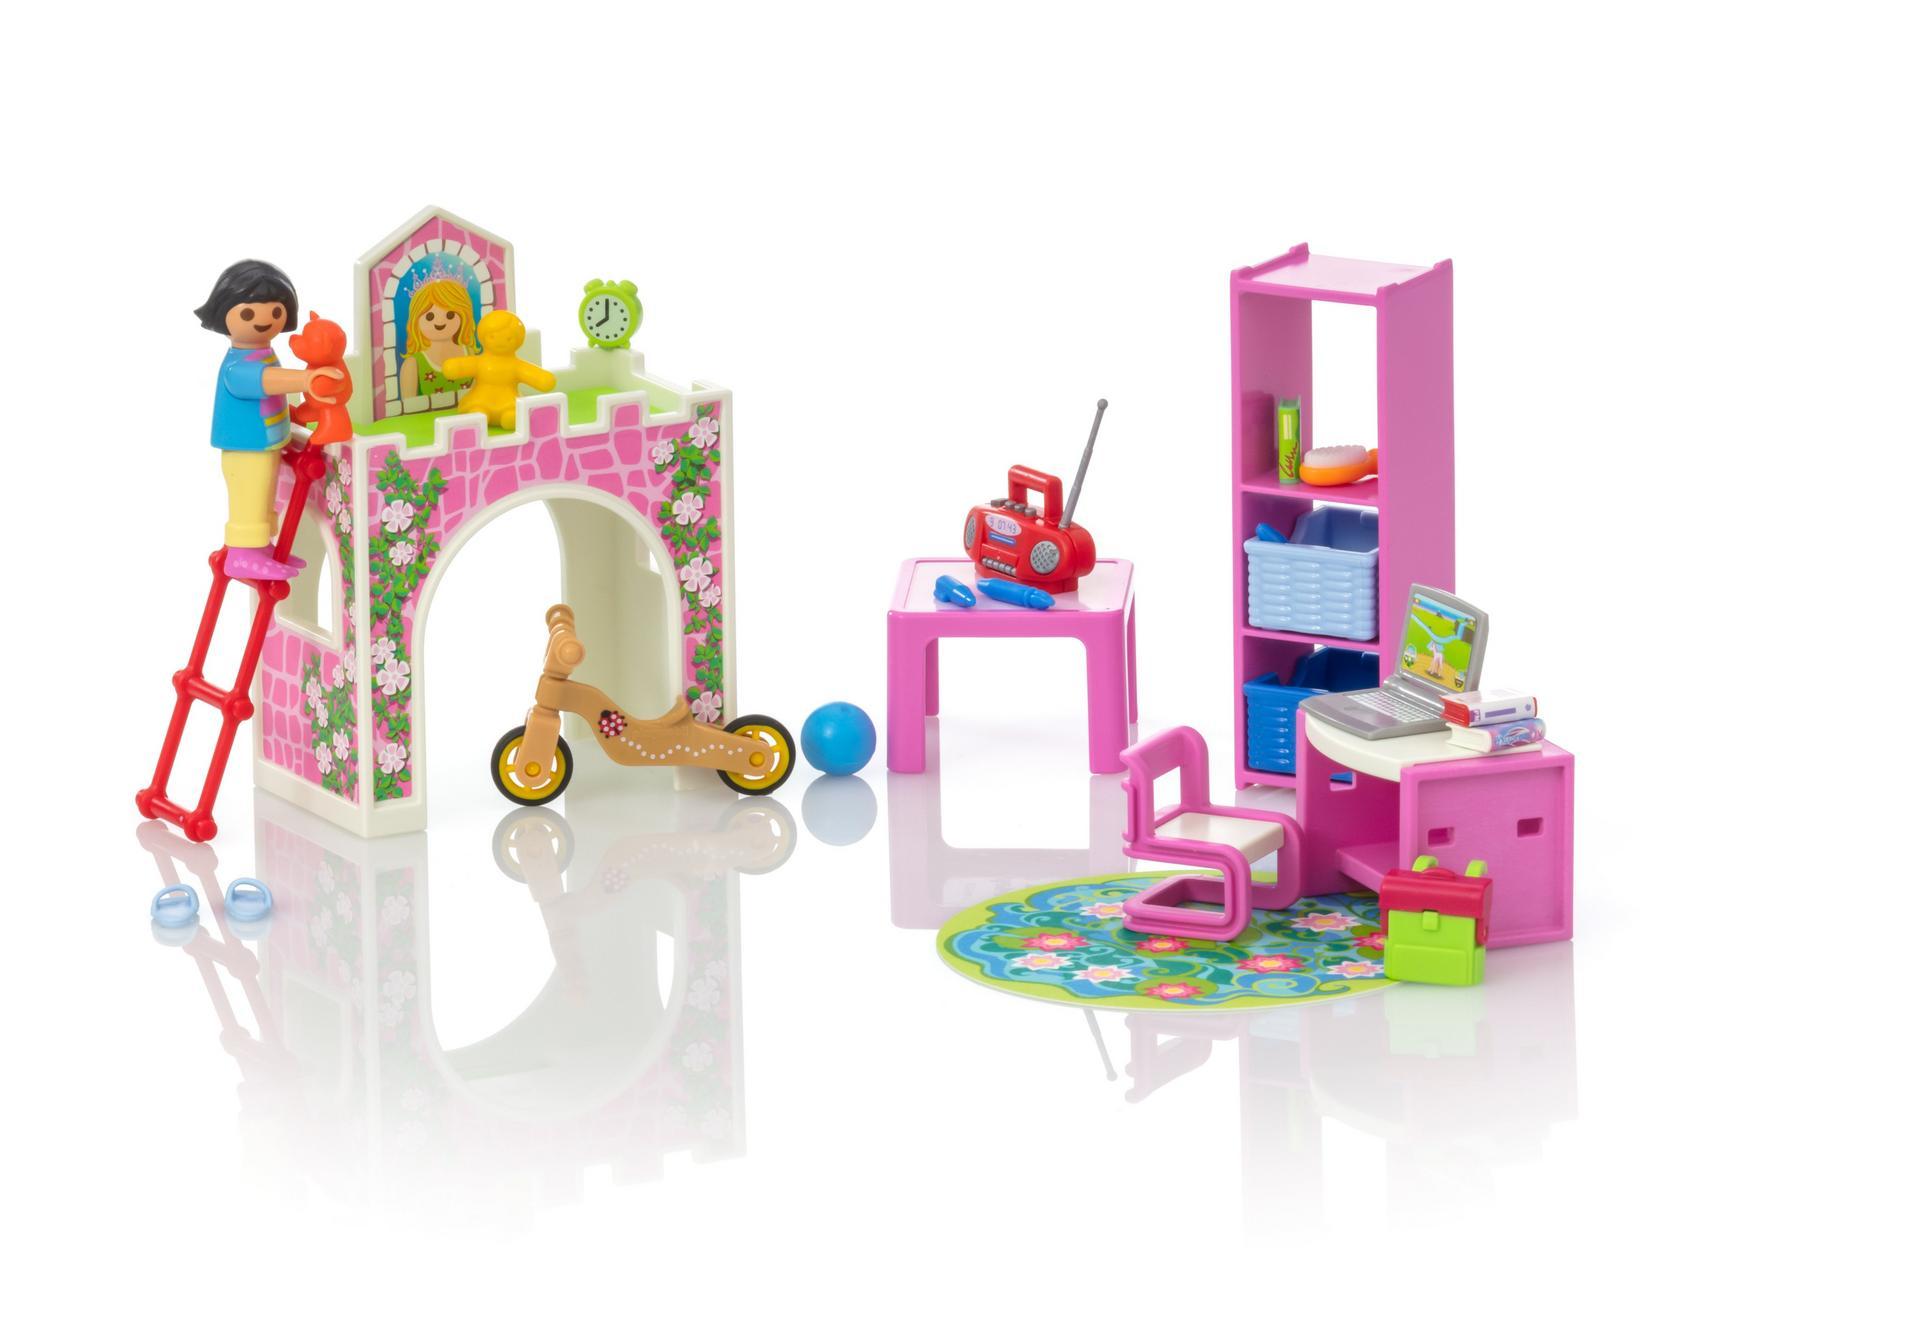 Ausmalbilder Playmobil Krankenhaus : Atemberaubend Playmobil Luxusvilla Kinderzimmer Ideen